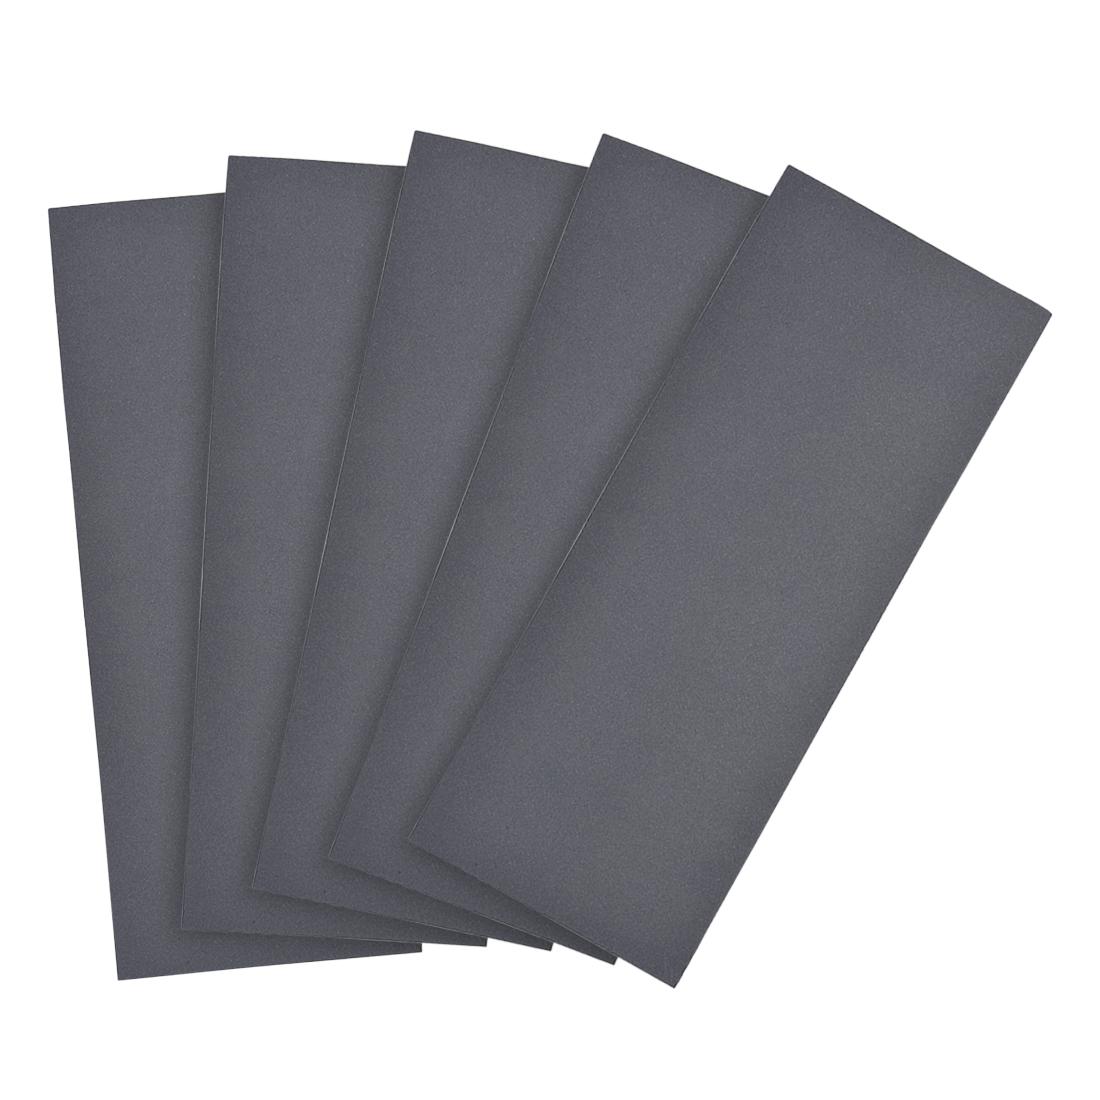 Waterproof Sandpaper, Wet Dry Sand Paper Grit of 800, 9 x 3.7inch 5pcs